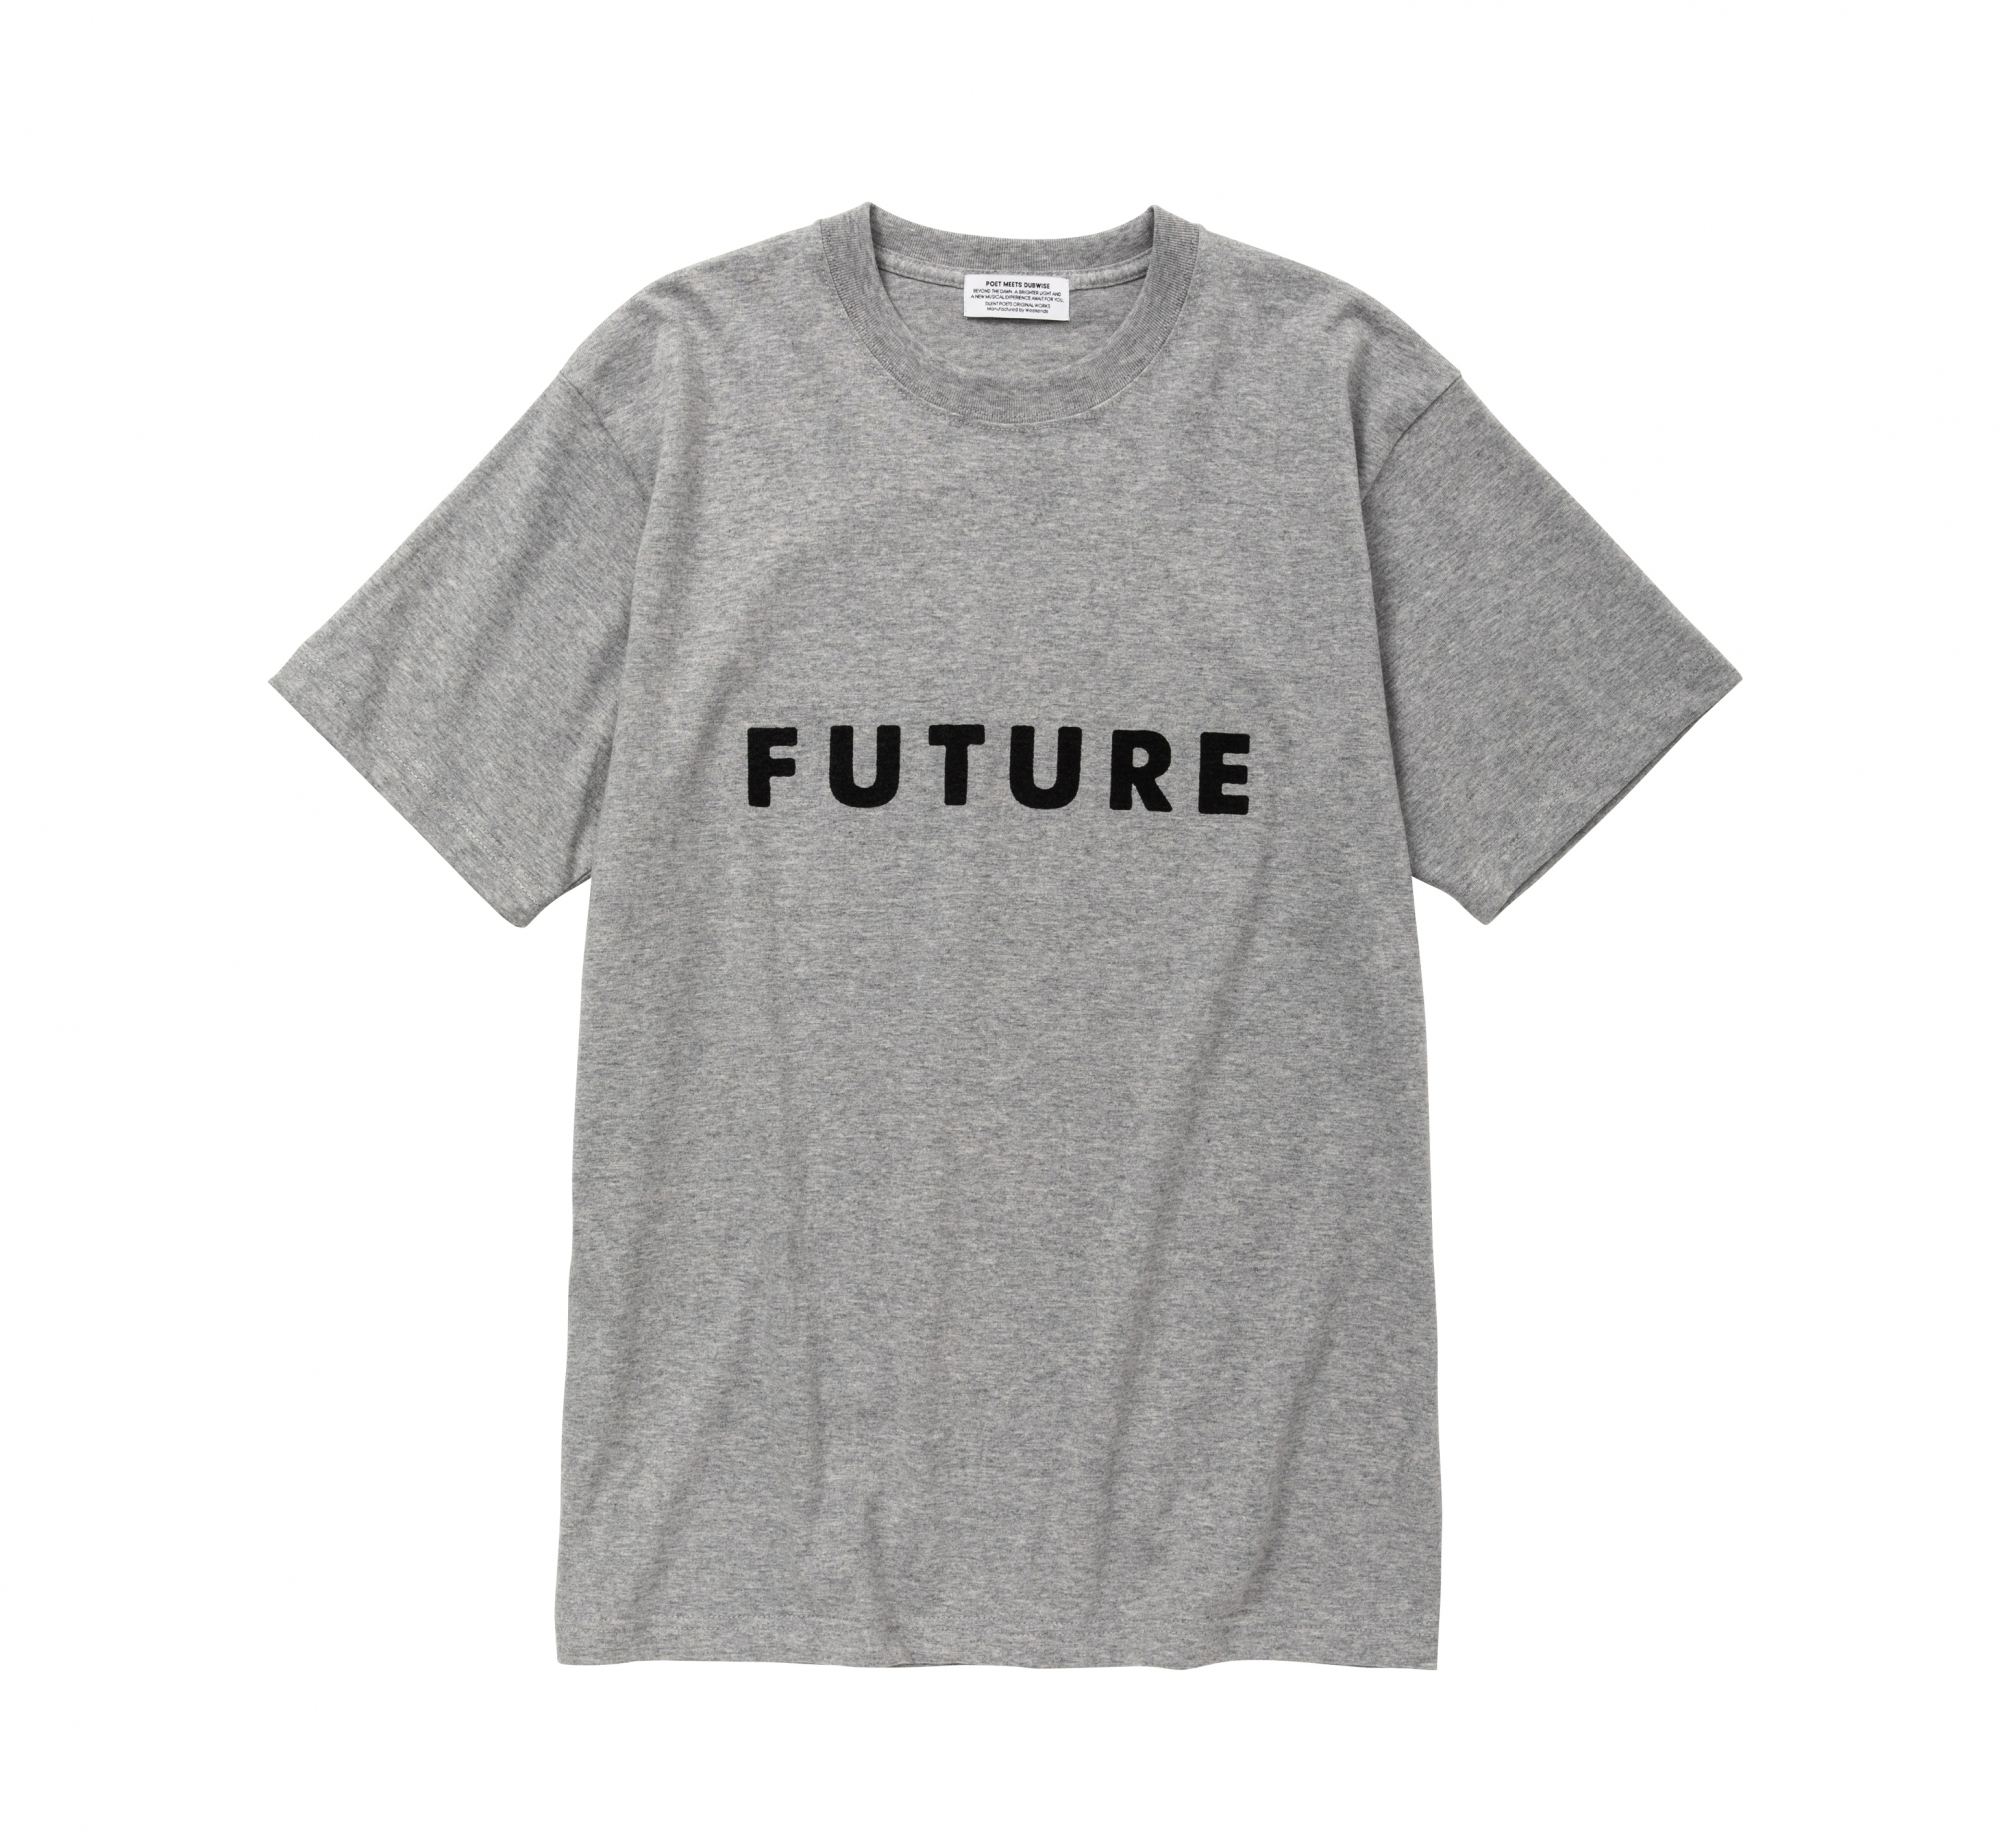 POET MEETS DUBWISE / LOGO TEE(FUTURE)